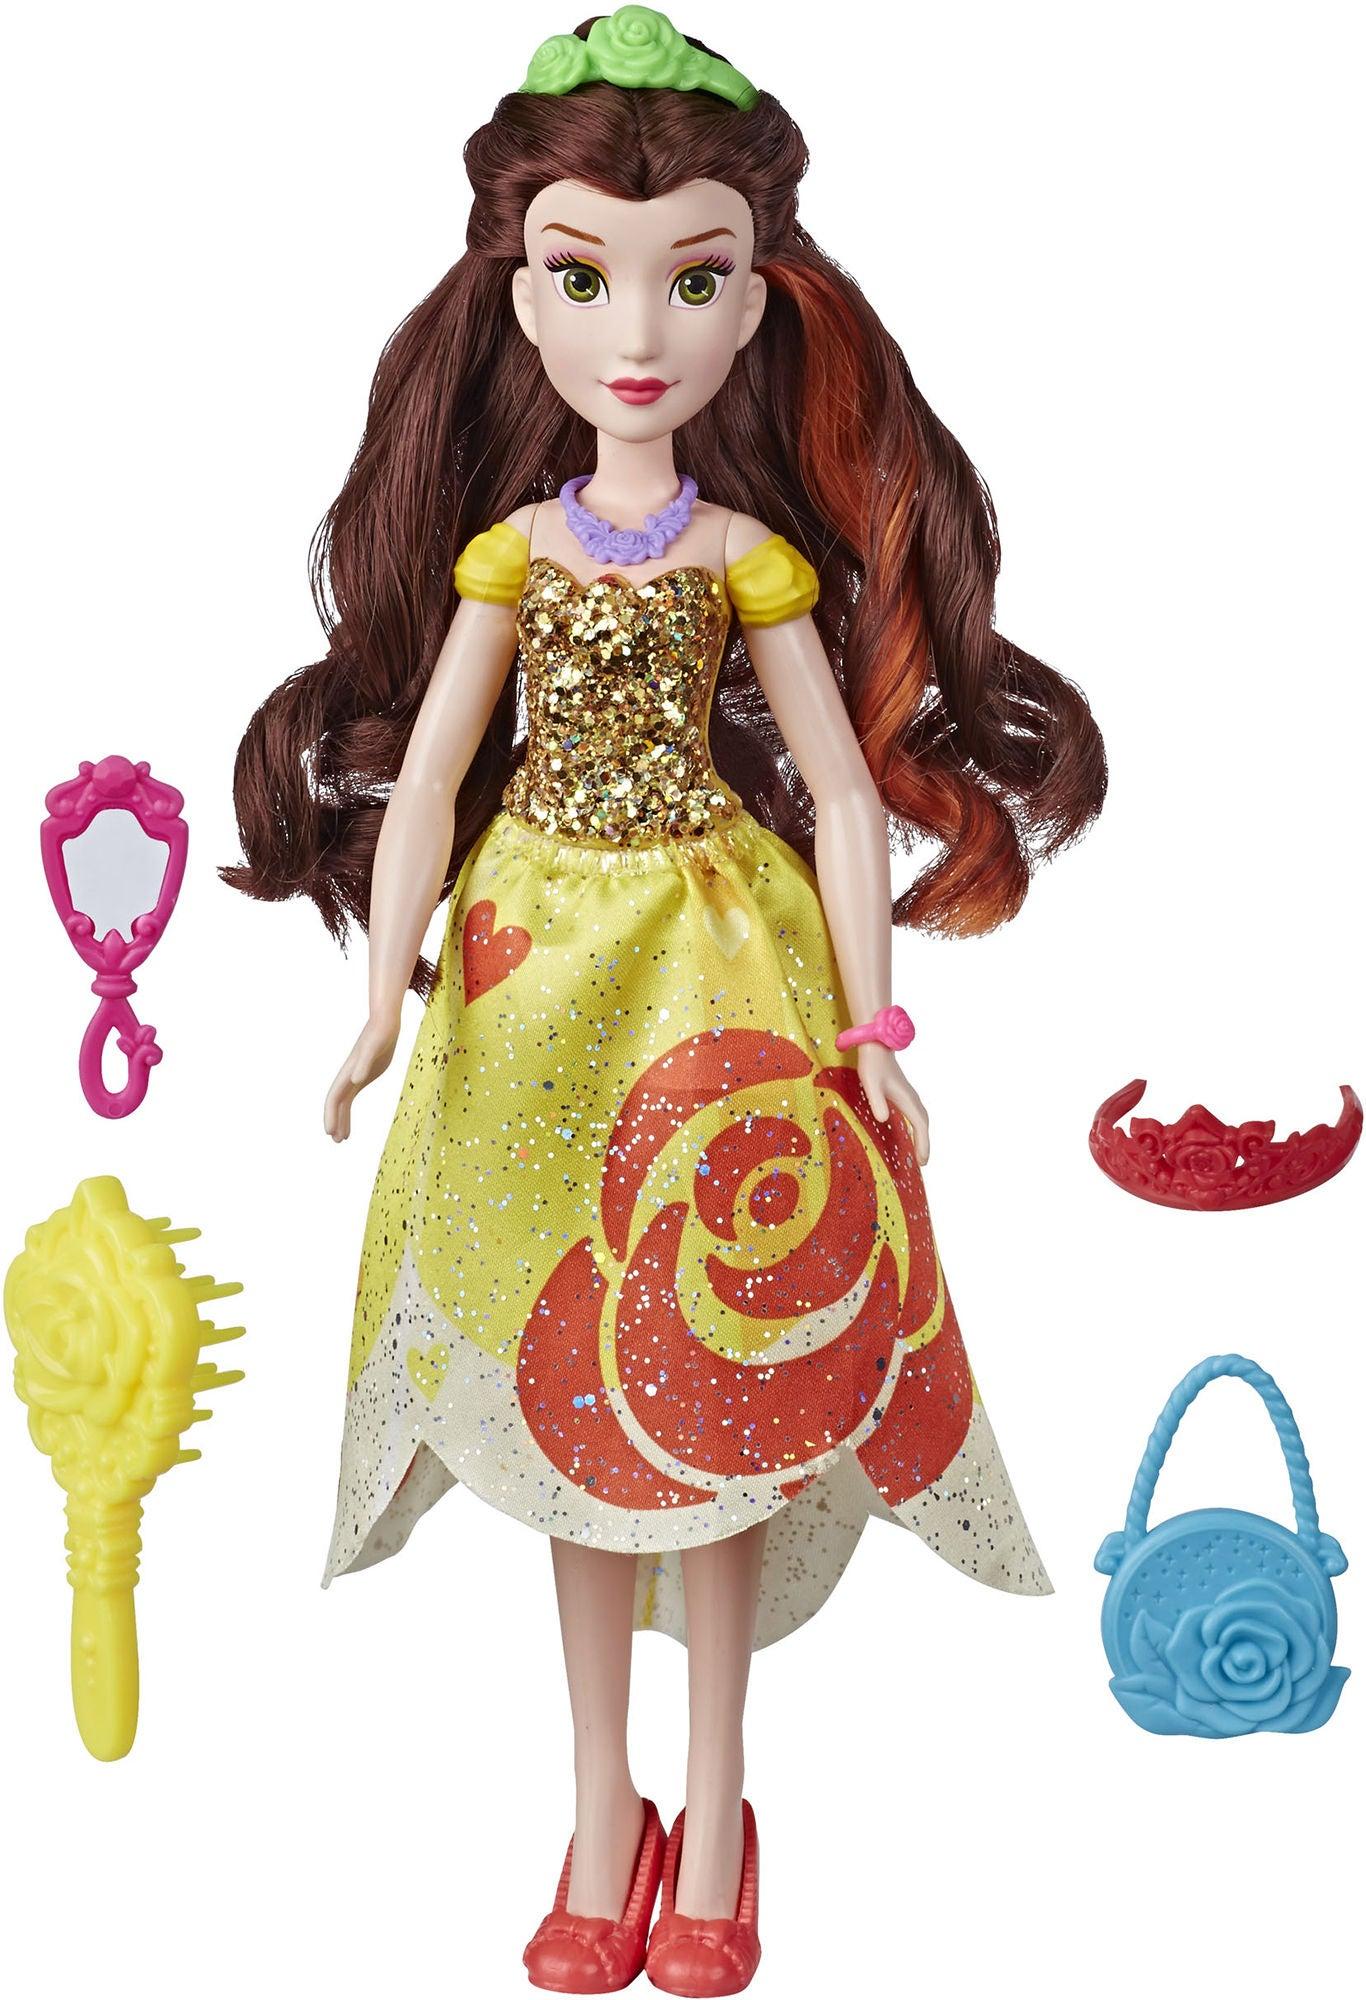 Disney Prinsessat Nukke Belle + Lisätarvikkeet